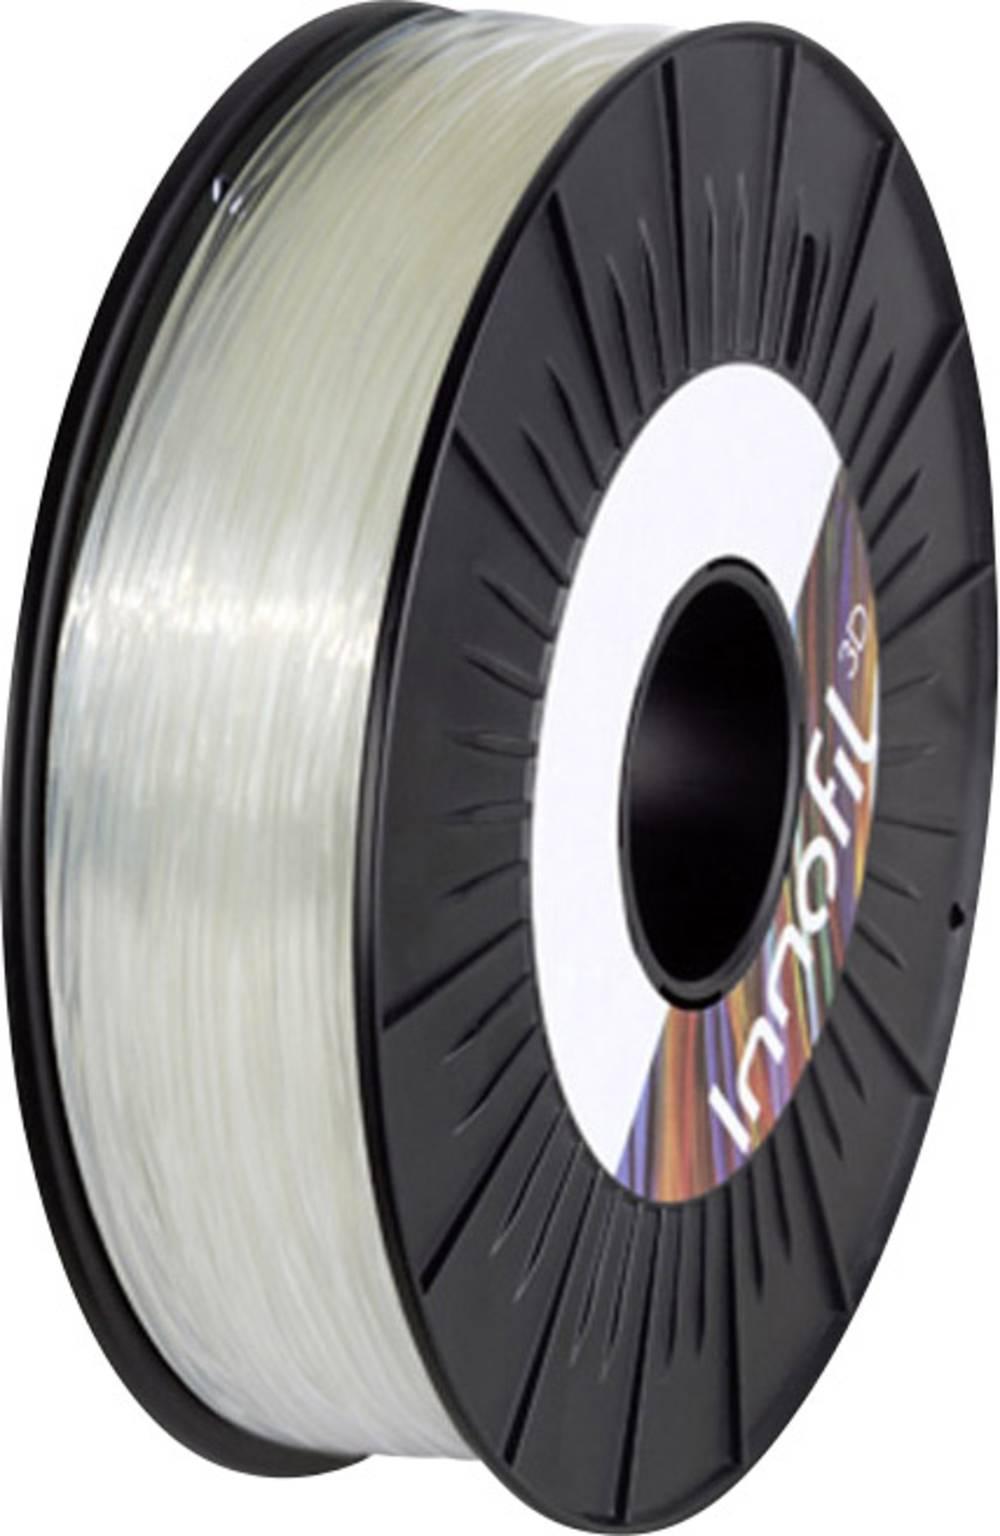 Filament Innofil 3D FL45-2001B050 PLA kompozit, fleksibilen Filament 2.85 mm naravne barve 500 g